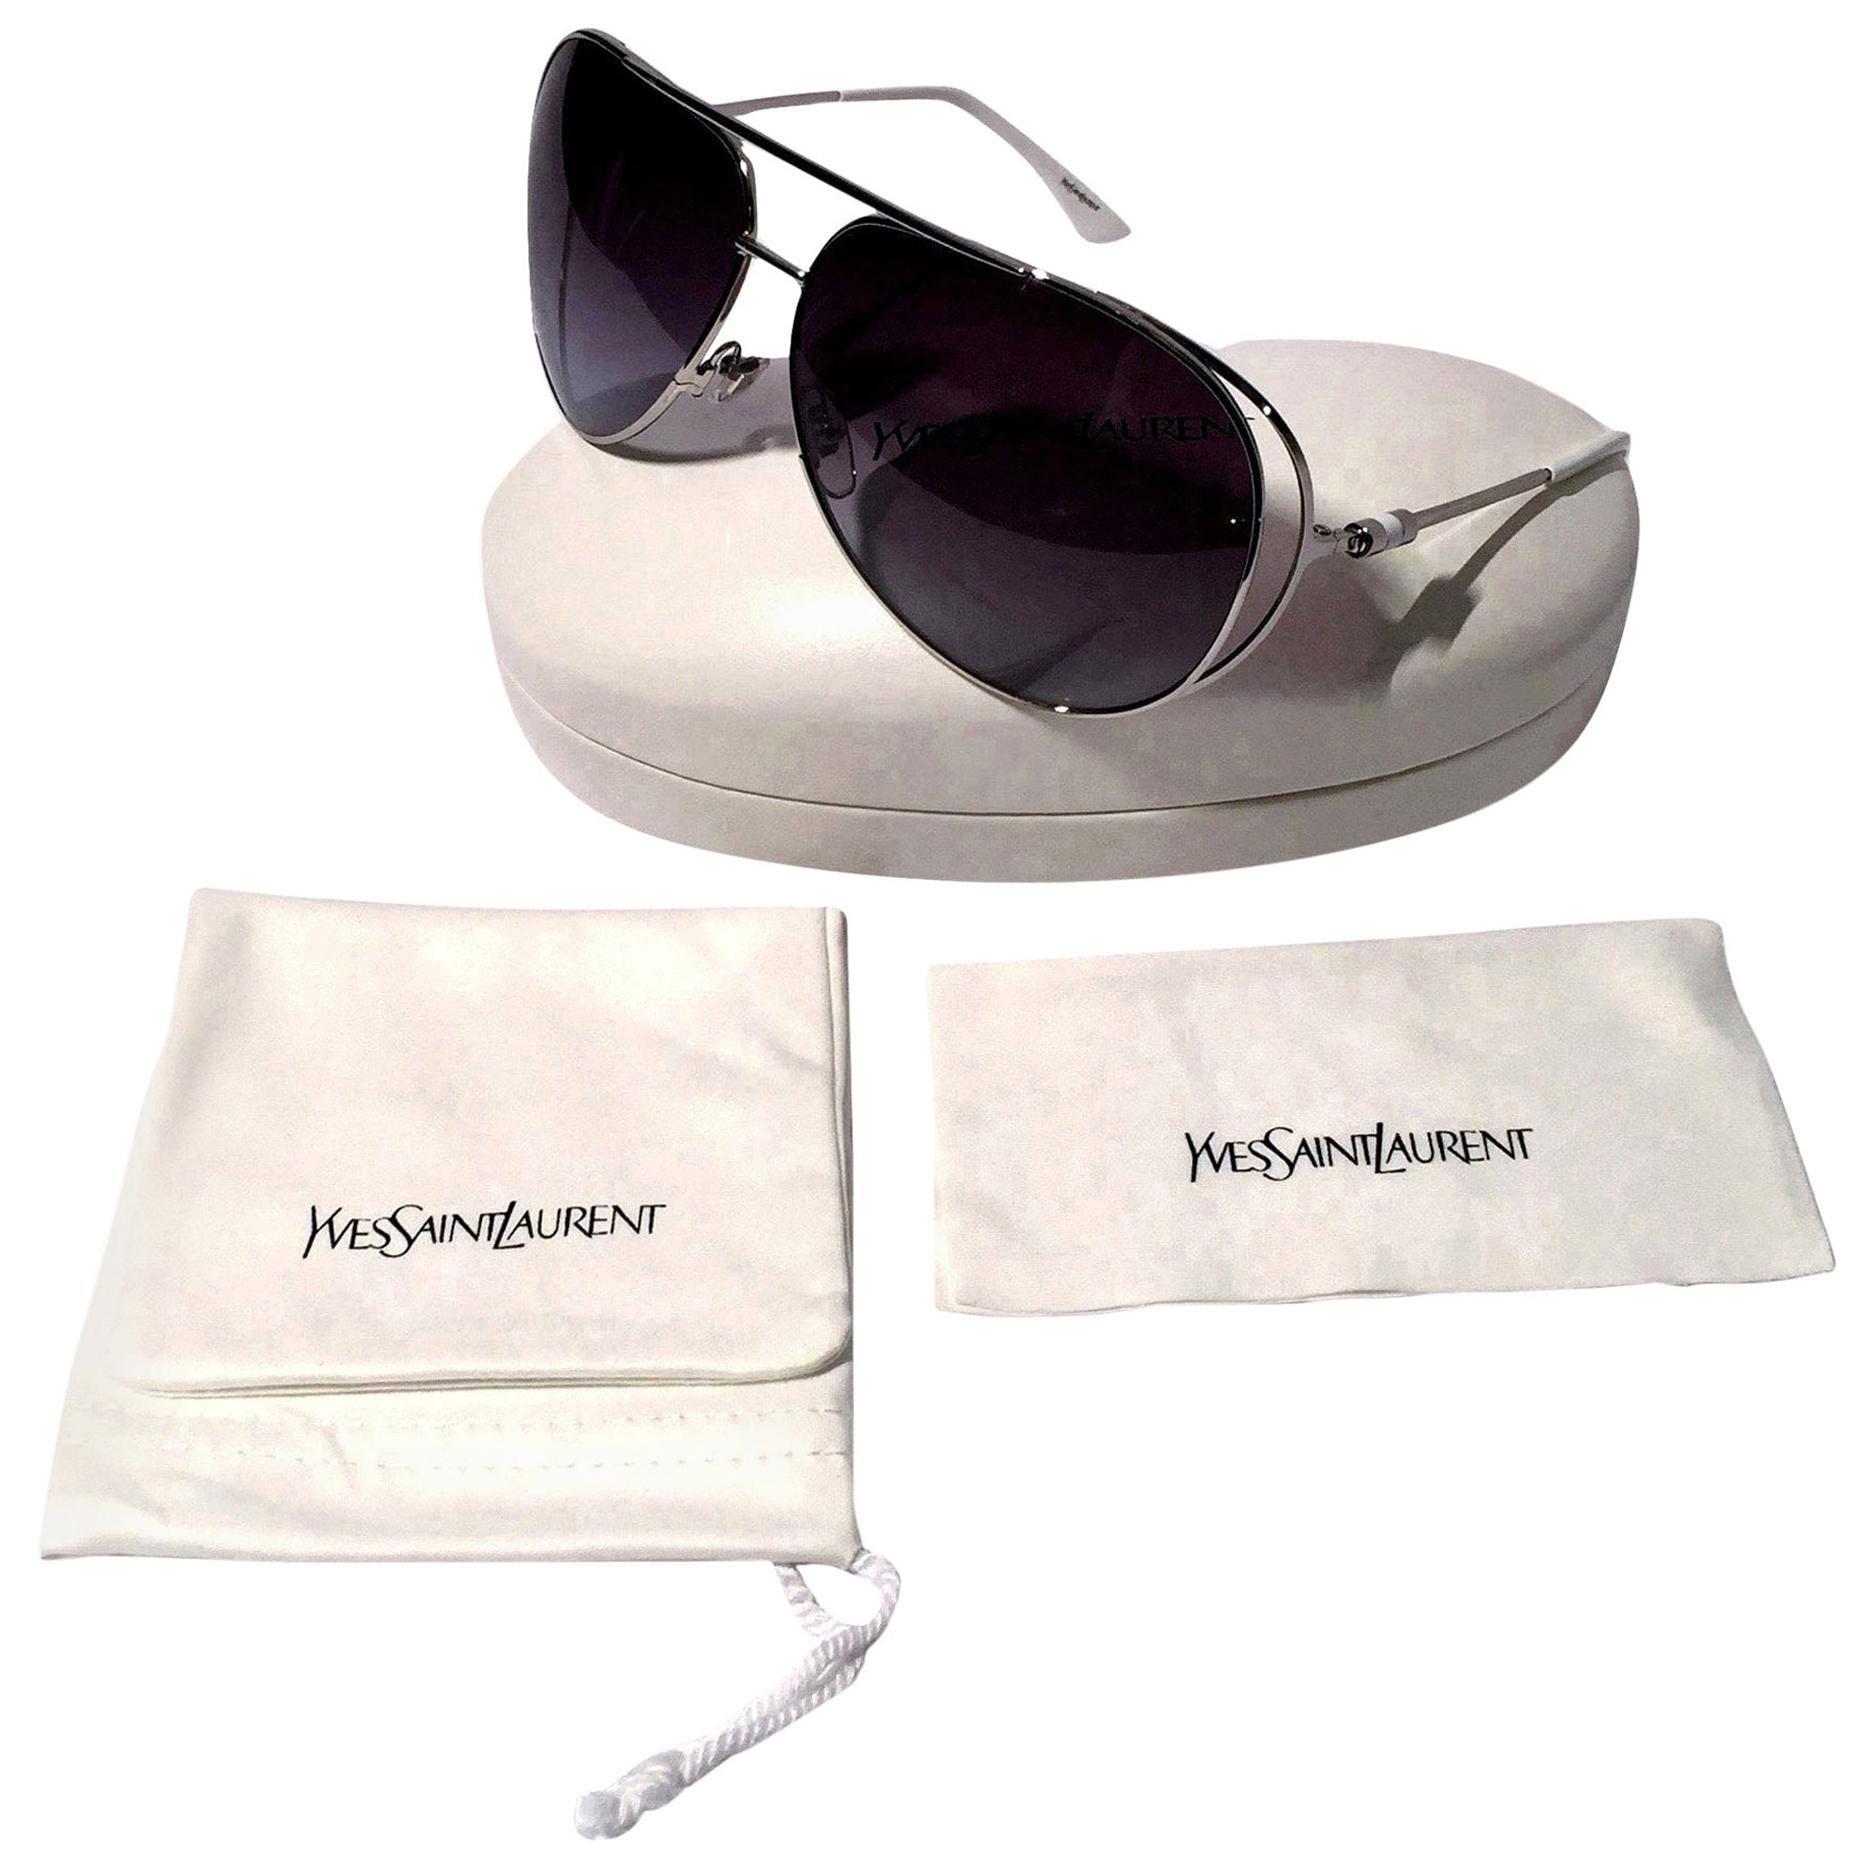 New Yves Saint Laurent YSL Aviator Sunglasses  With Case